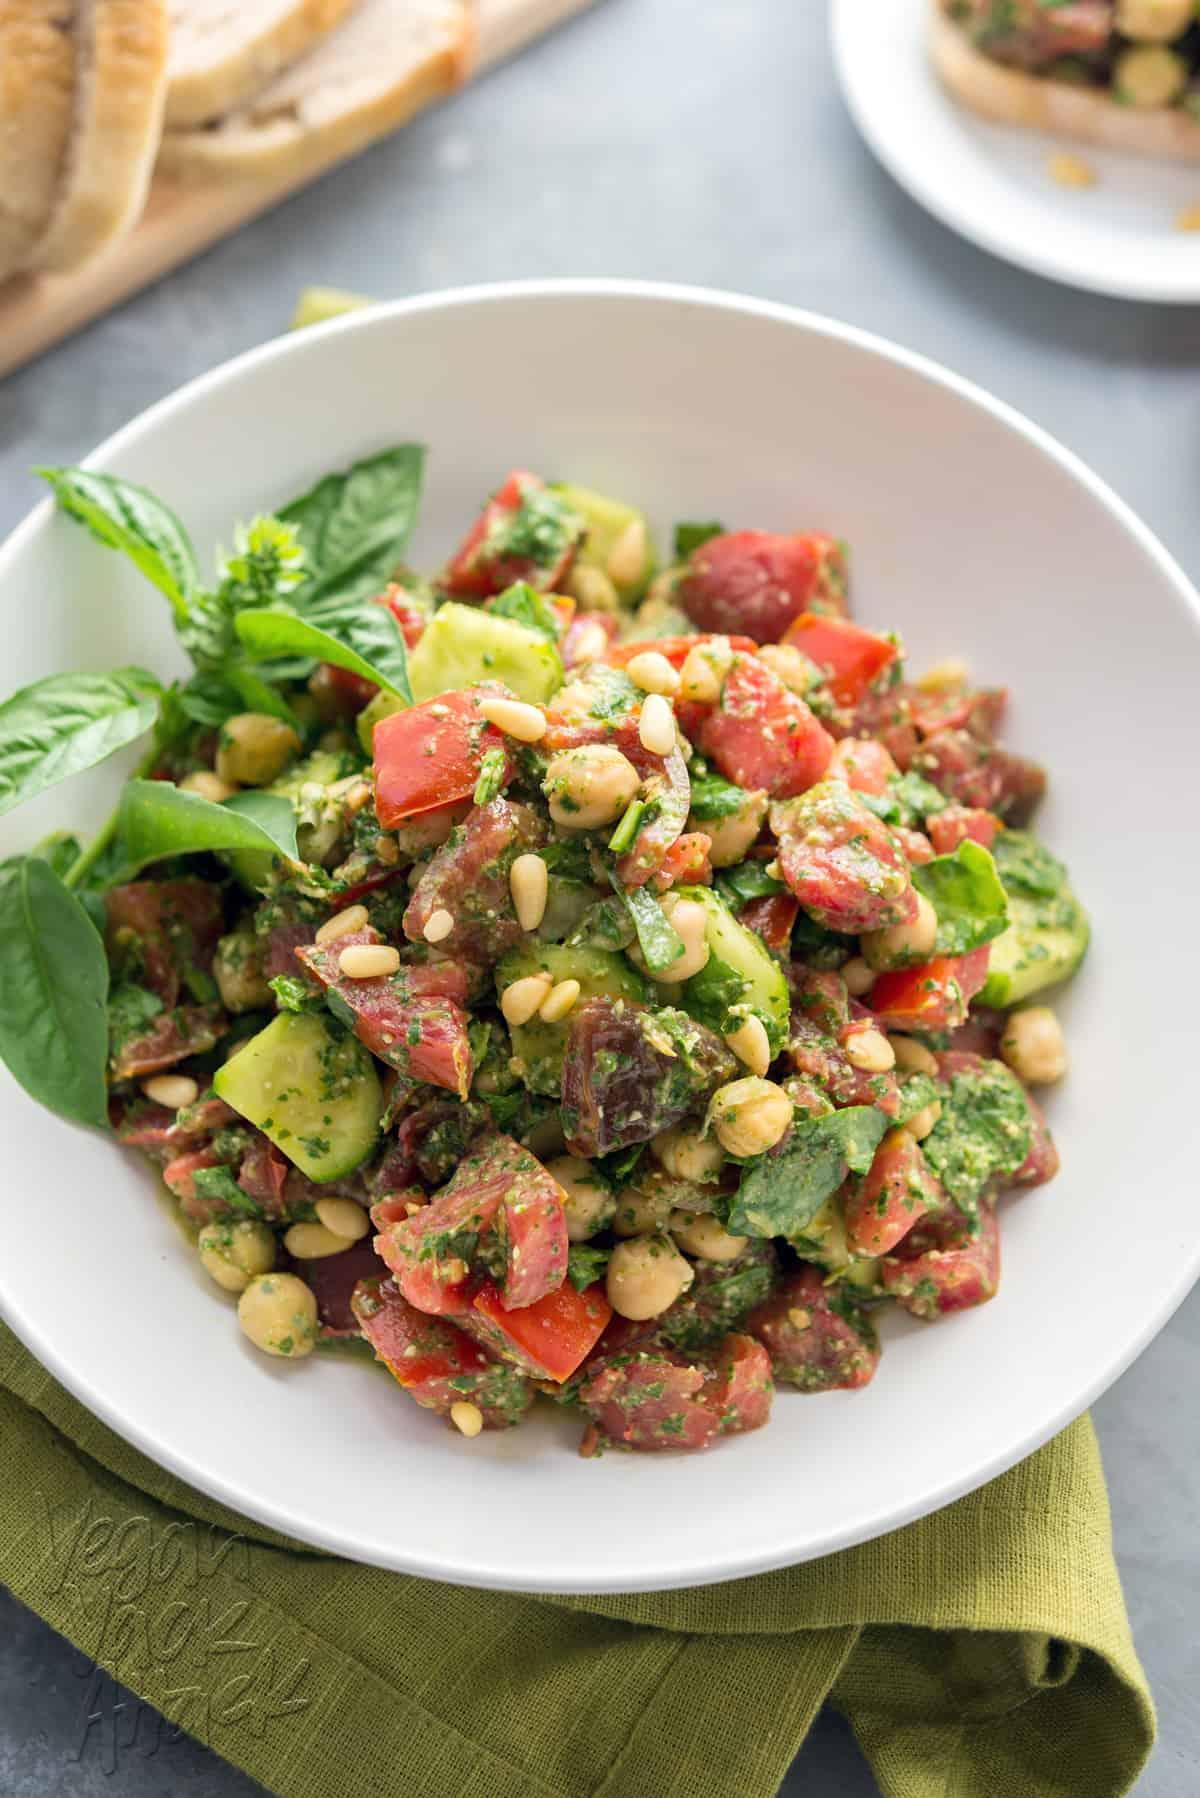 Oil-free Pesto Tomato Chickpea Salad - A great way to use Summer produce! #vegan #glutenfree